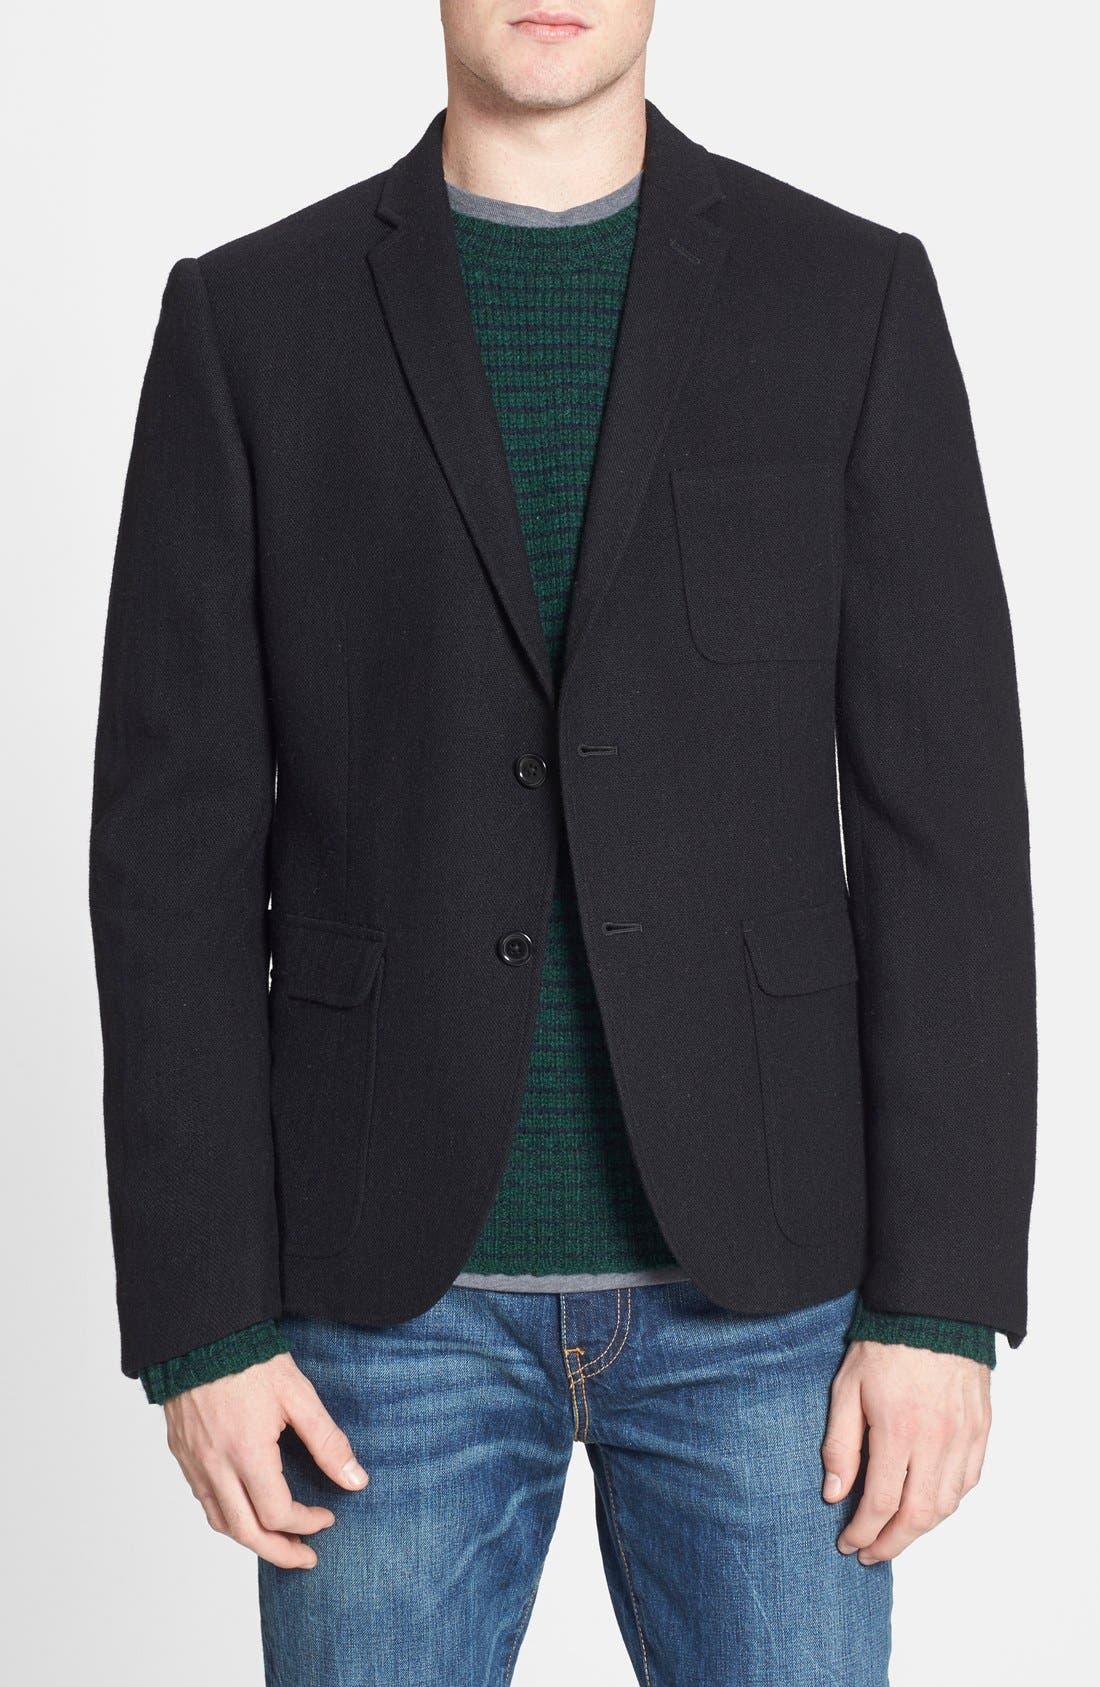 DOCKERS<SUP>®</SUP> Dockers Trim Fit Wool Blend Blazer, Main, color, 001